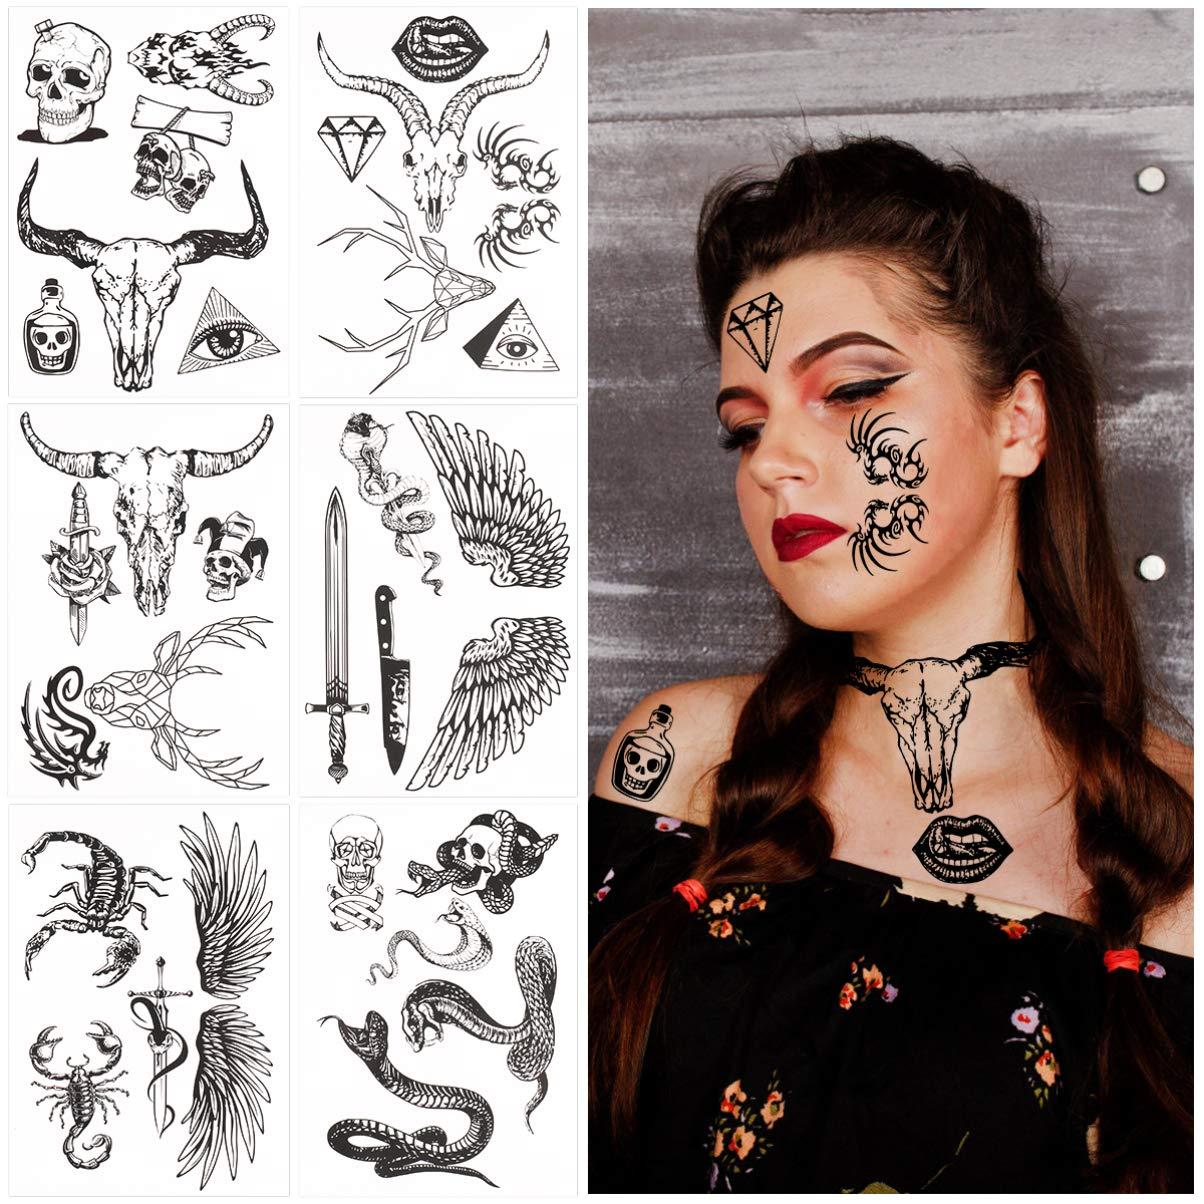 Halloween Face Tattoos Set Waterproof Temporary Tattoos Sticker for Halloween Costume Halloween Party Favor Supplies 6 Sheets